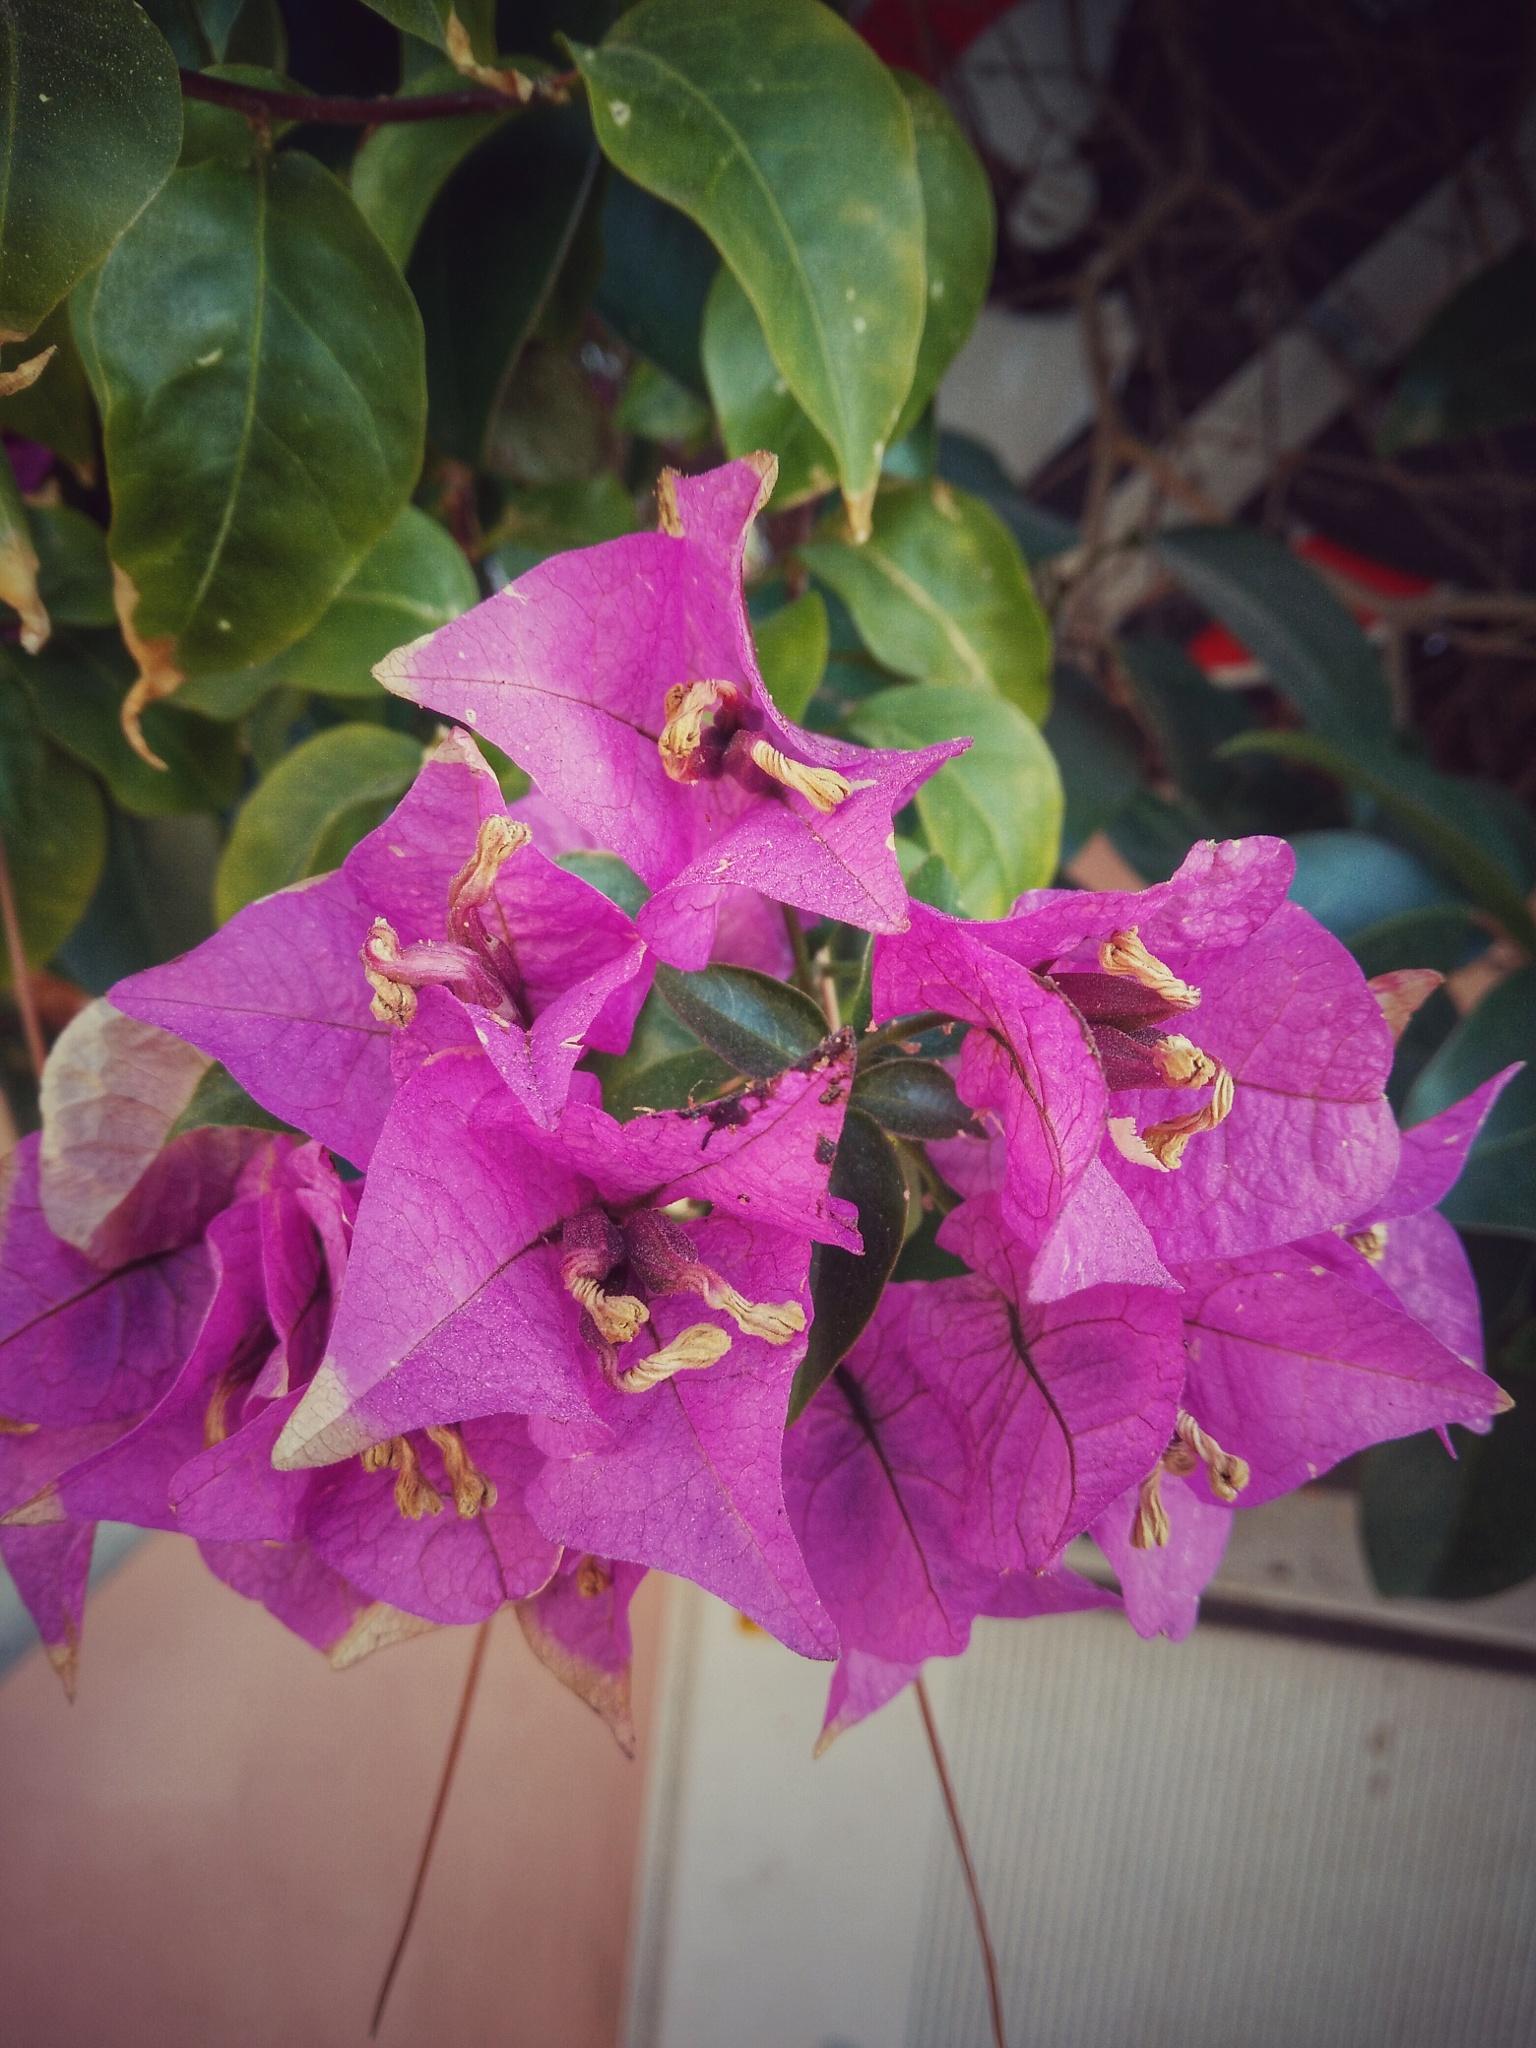 Flowers by Fabio Pinna